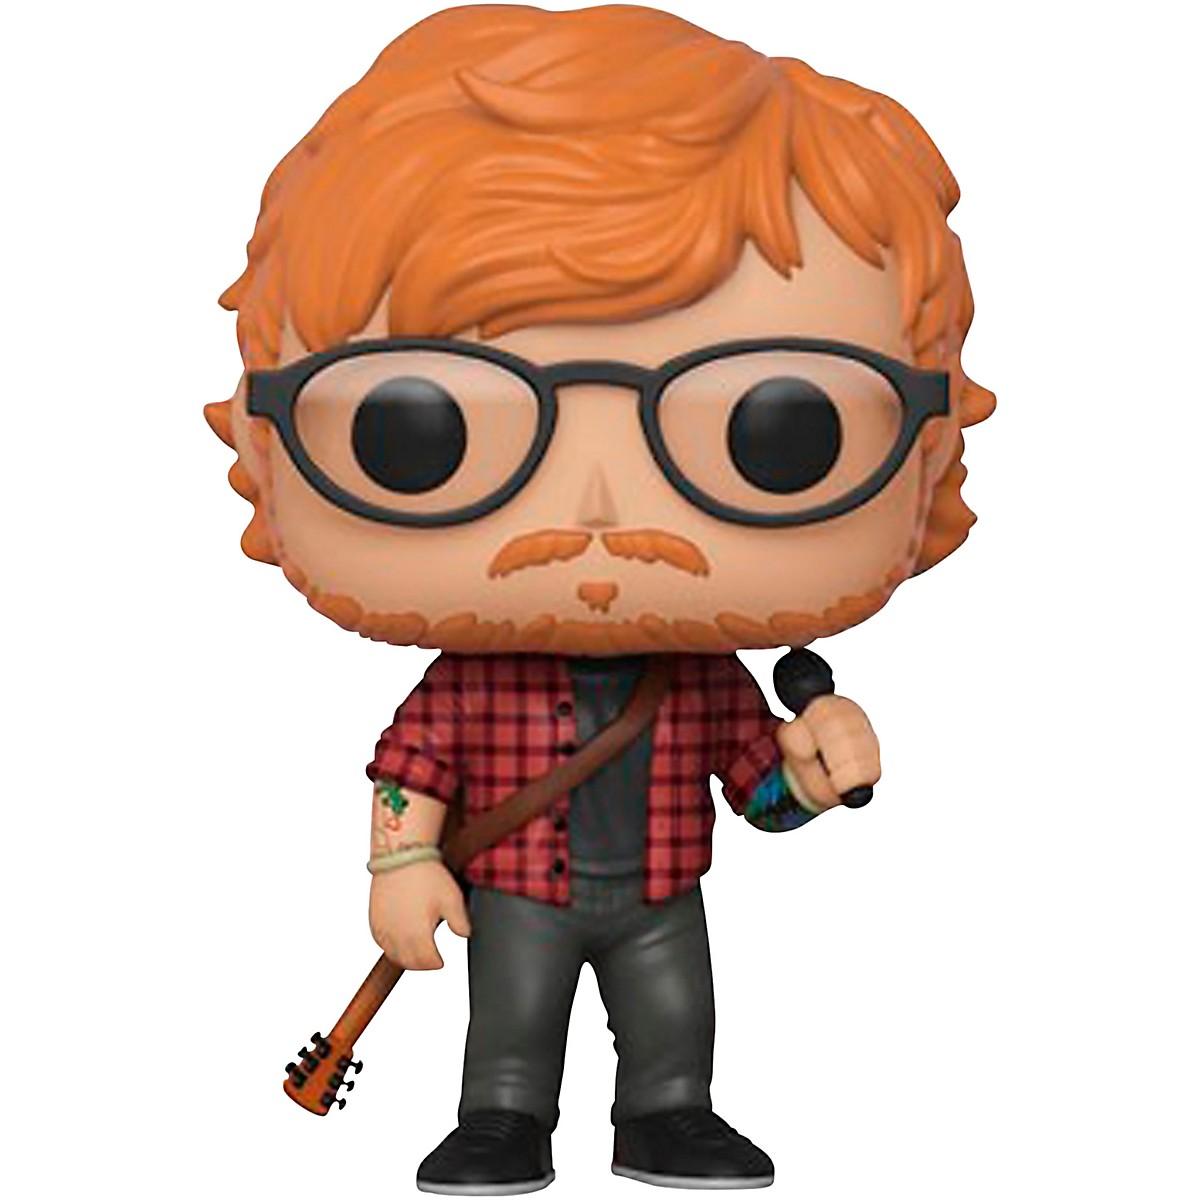 Funko Ed Sheeran Pop! Vinyl Figure